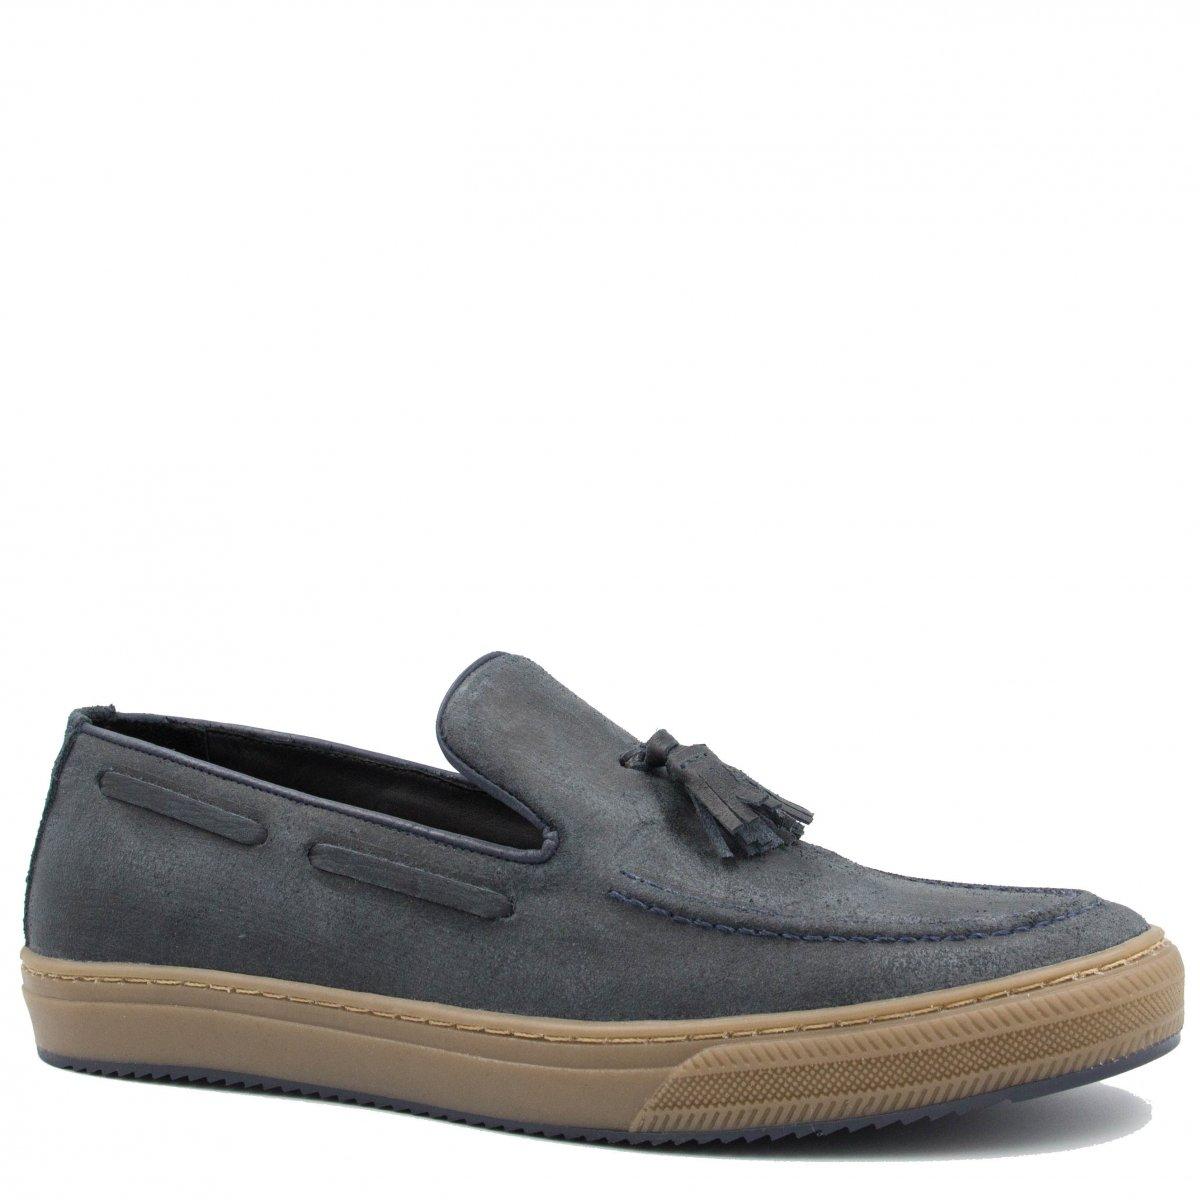 f44cd307b0 Sapato Zariff Shoes Mocassim em Couro Barbicacho 31018